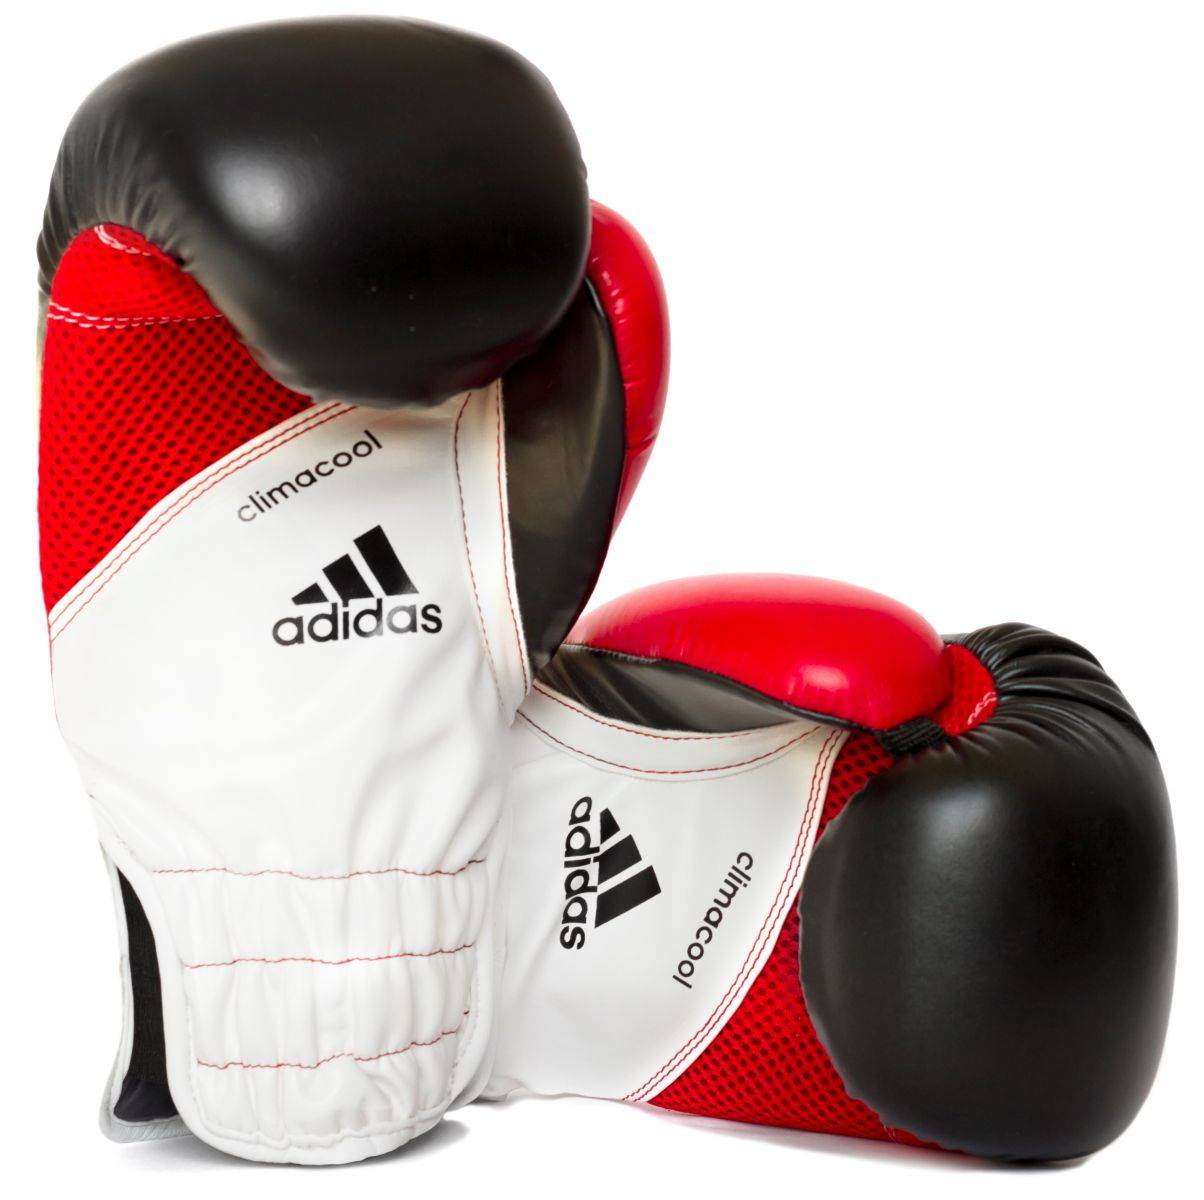 Детские боксерские перчатки Adidas Rookie Boxing Gloves-6